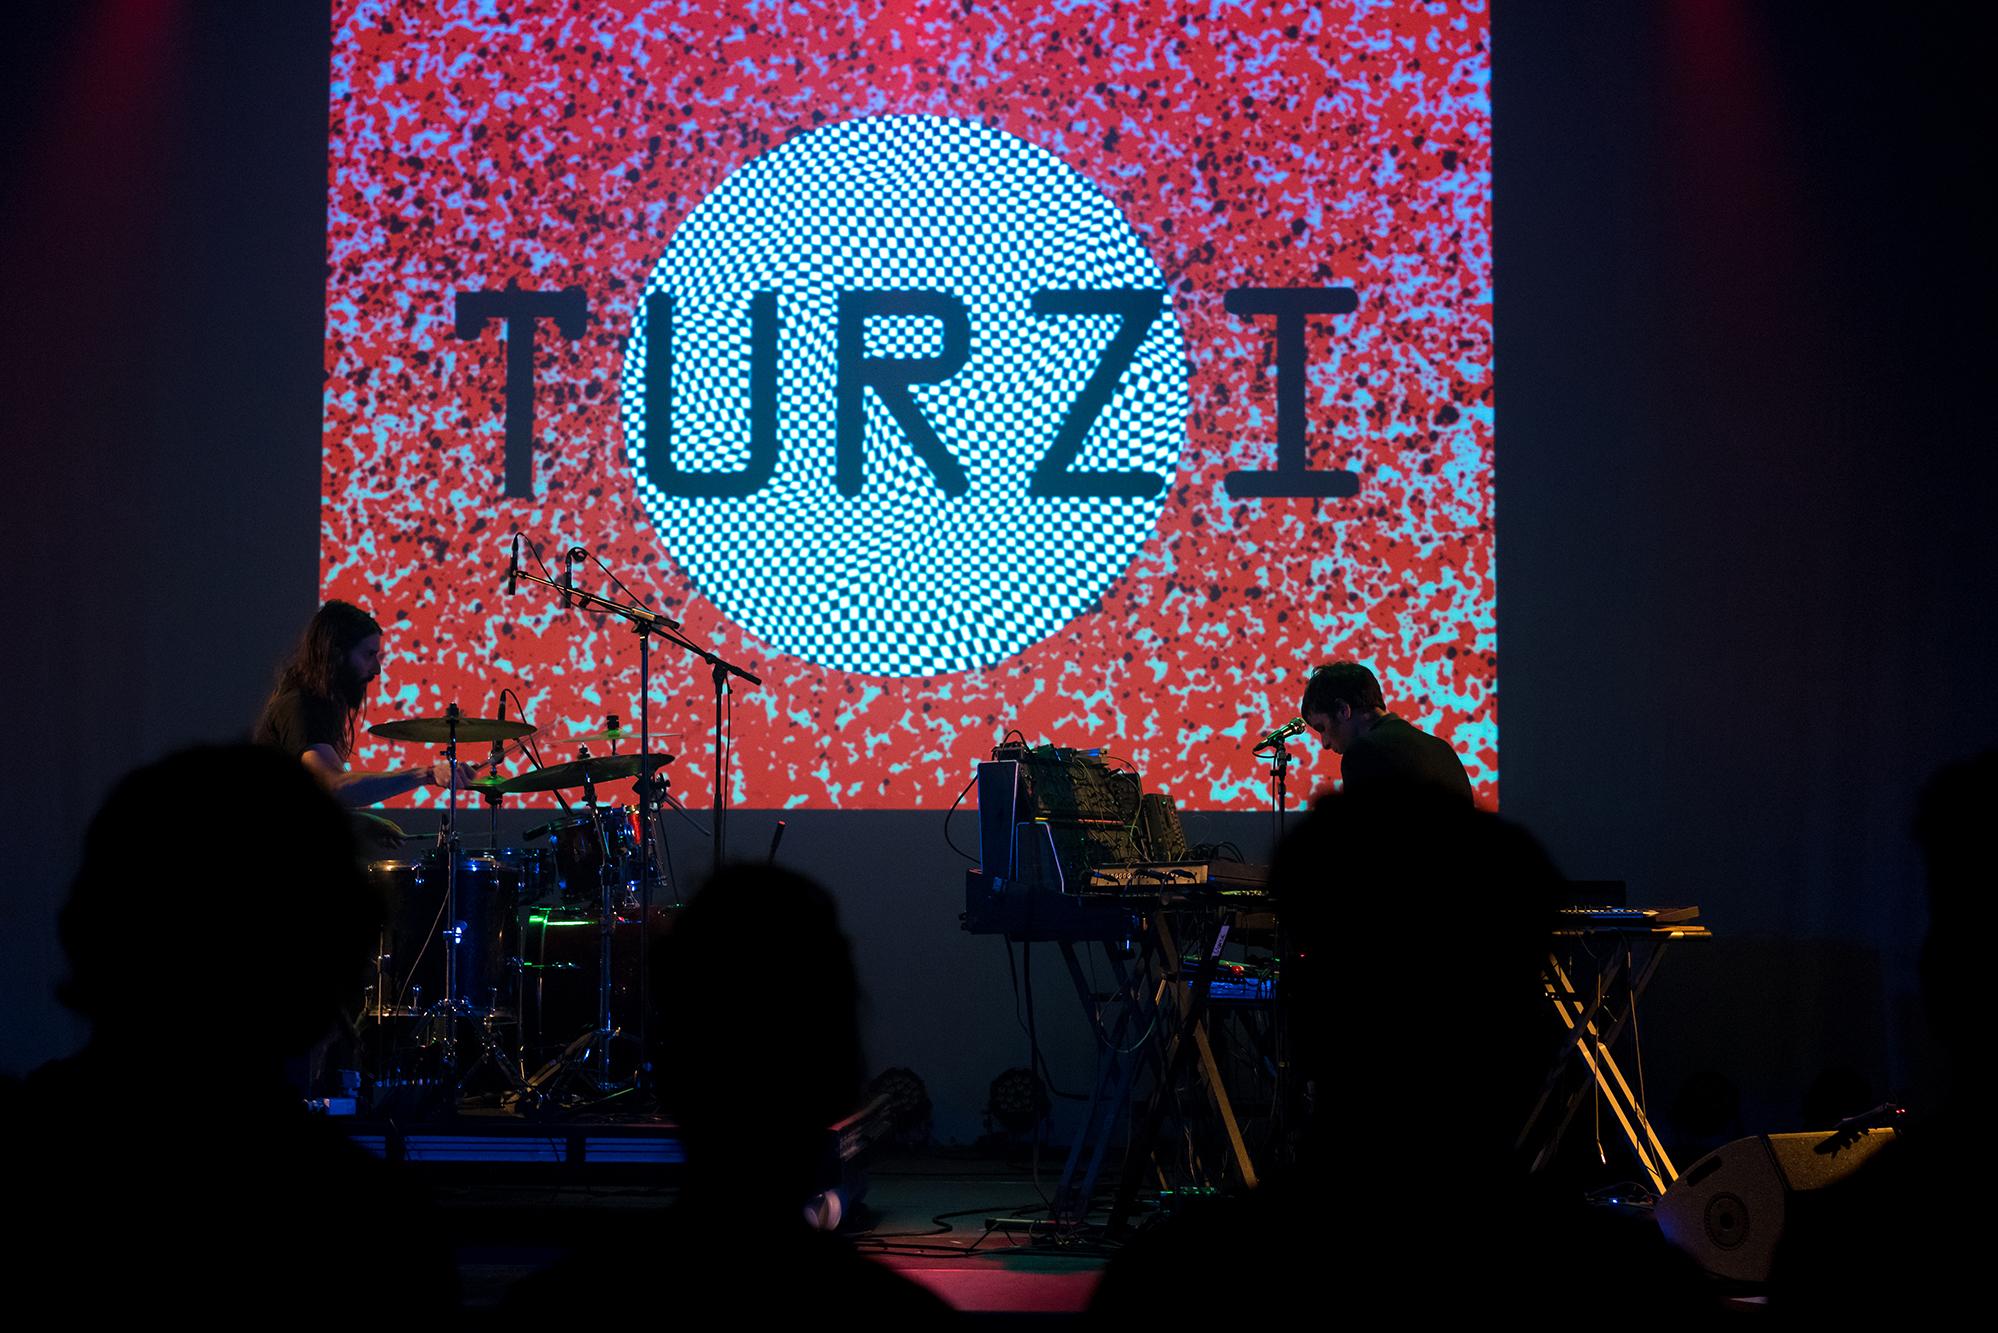 electrochic festival 2 mars 2017 photos @alexisjacq1-02234_web.jpg